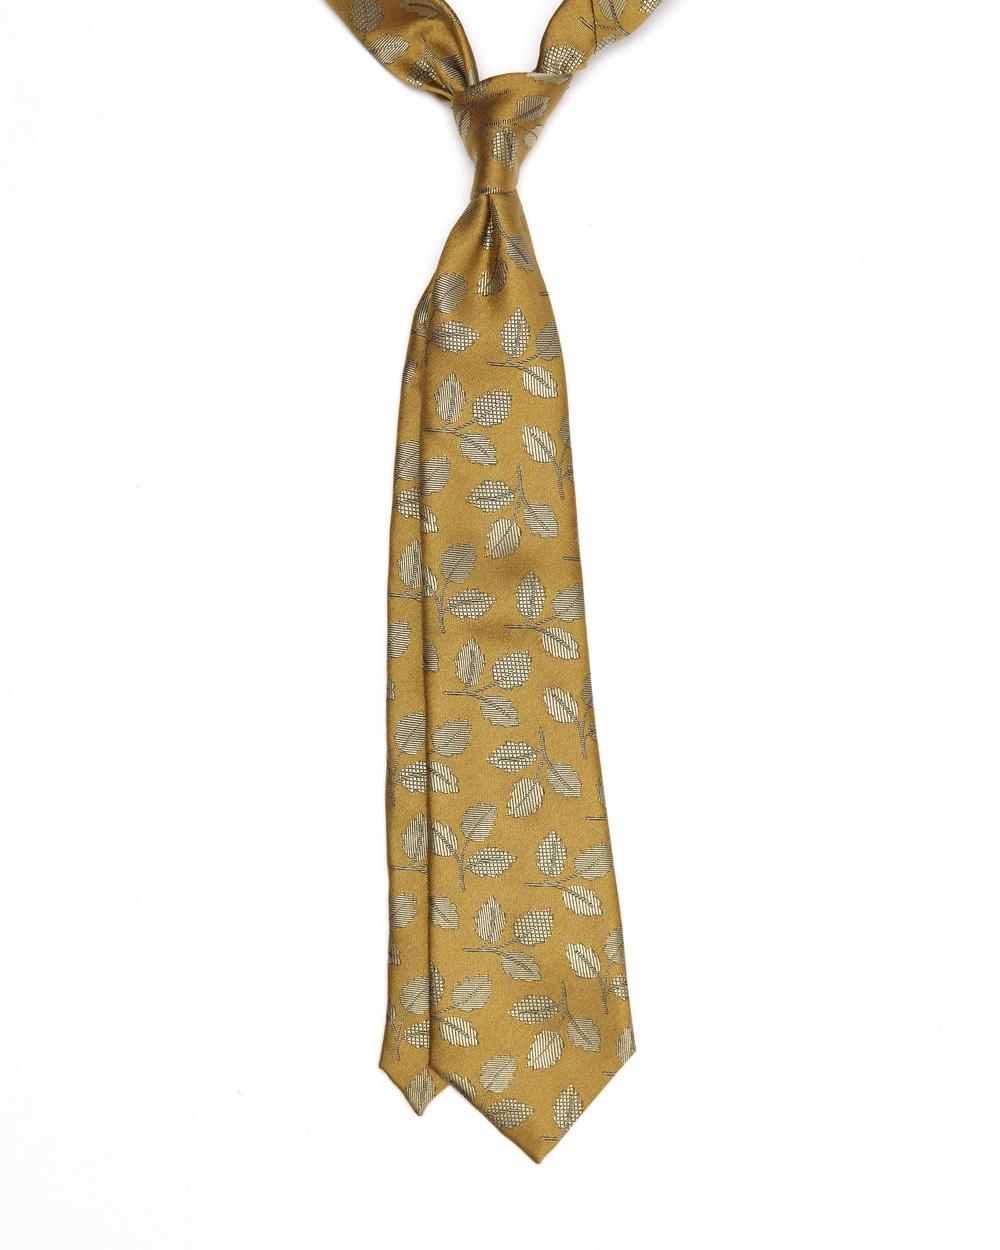 Hamilton Tie |100% Silk Jacquard Falling Leaves Pattern | Colour: Golden Yellow & Black